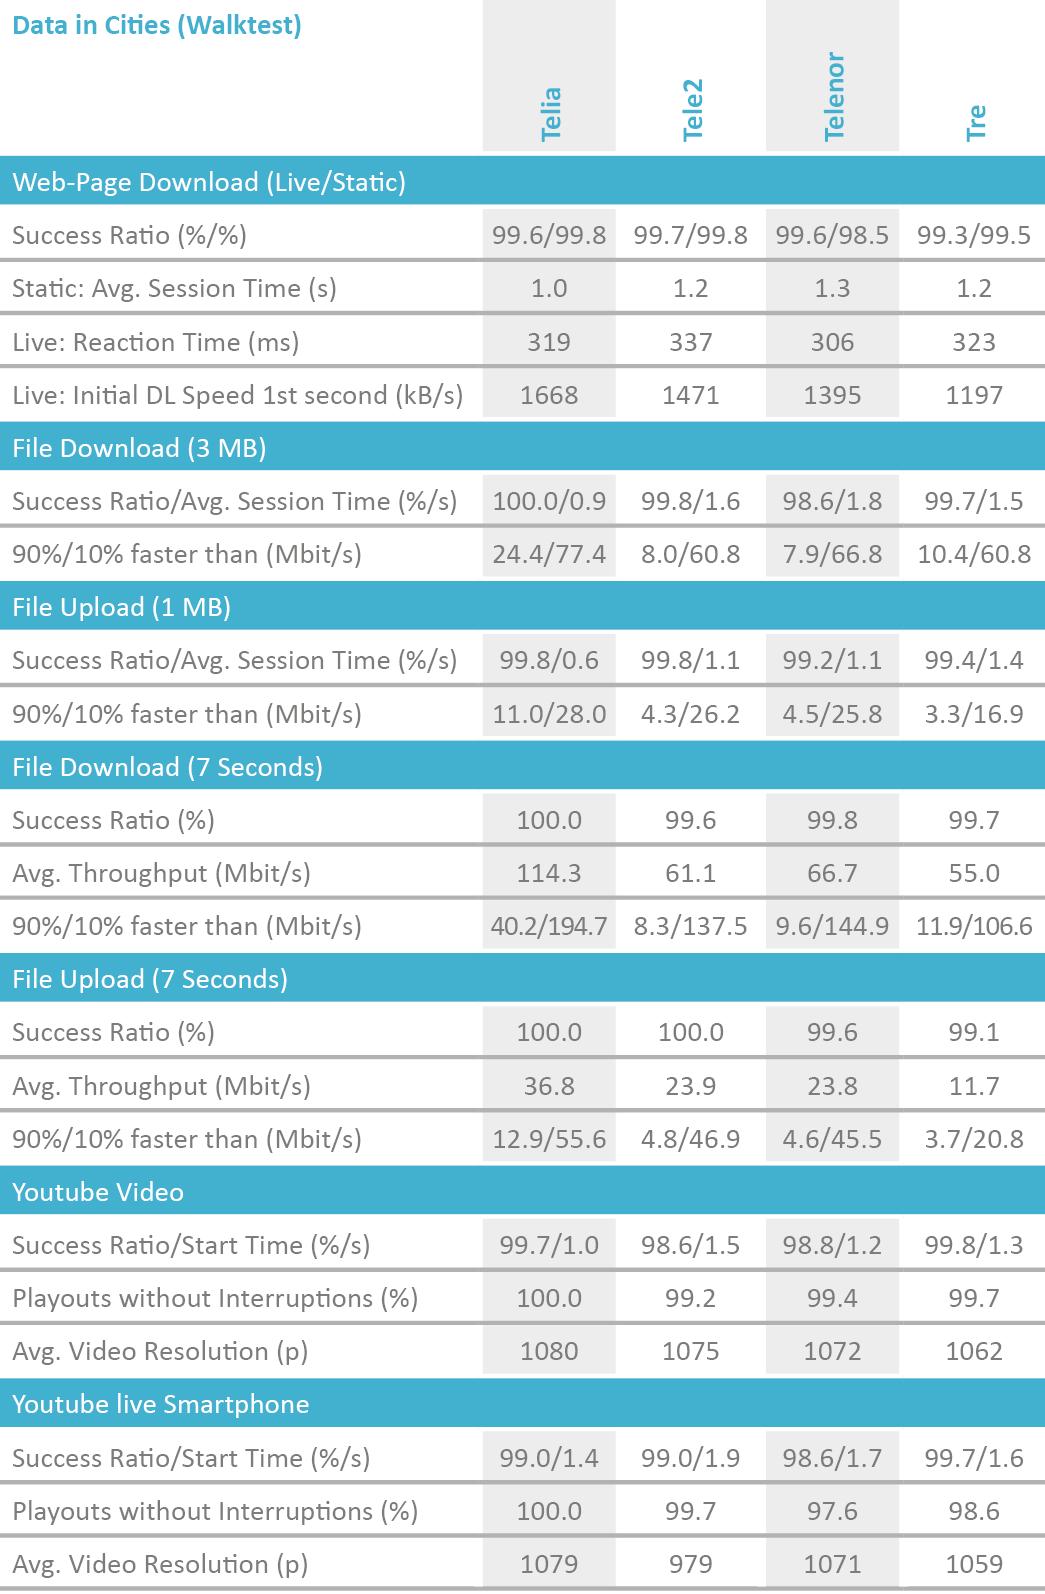 SE2019_table_DataCities_Walktest.png